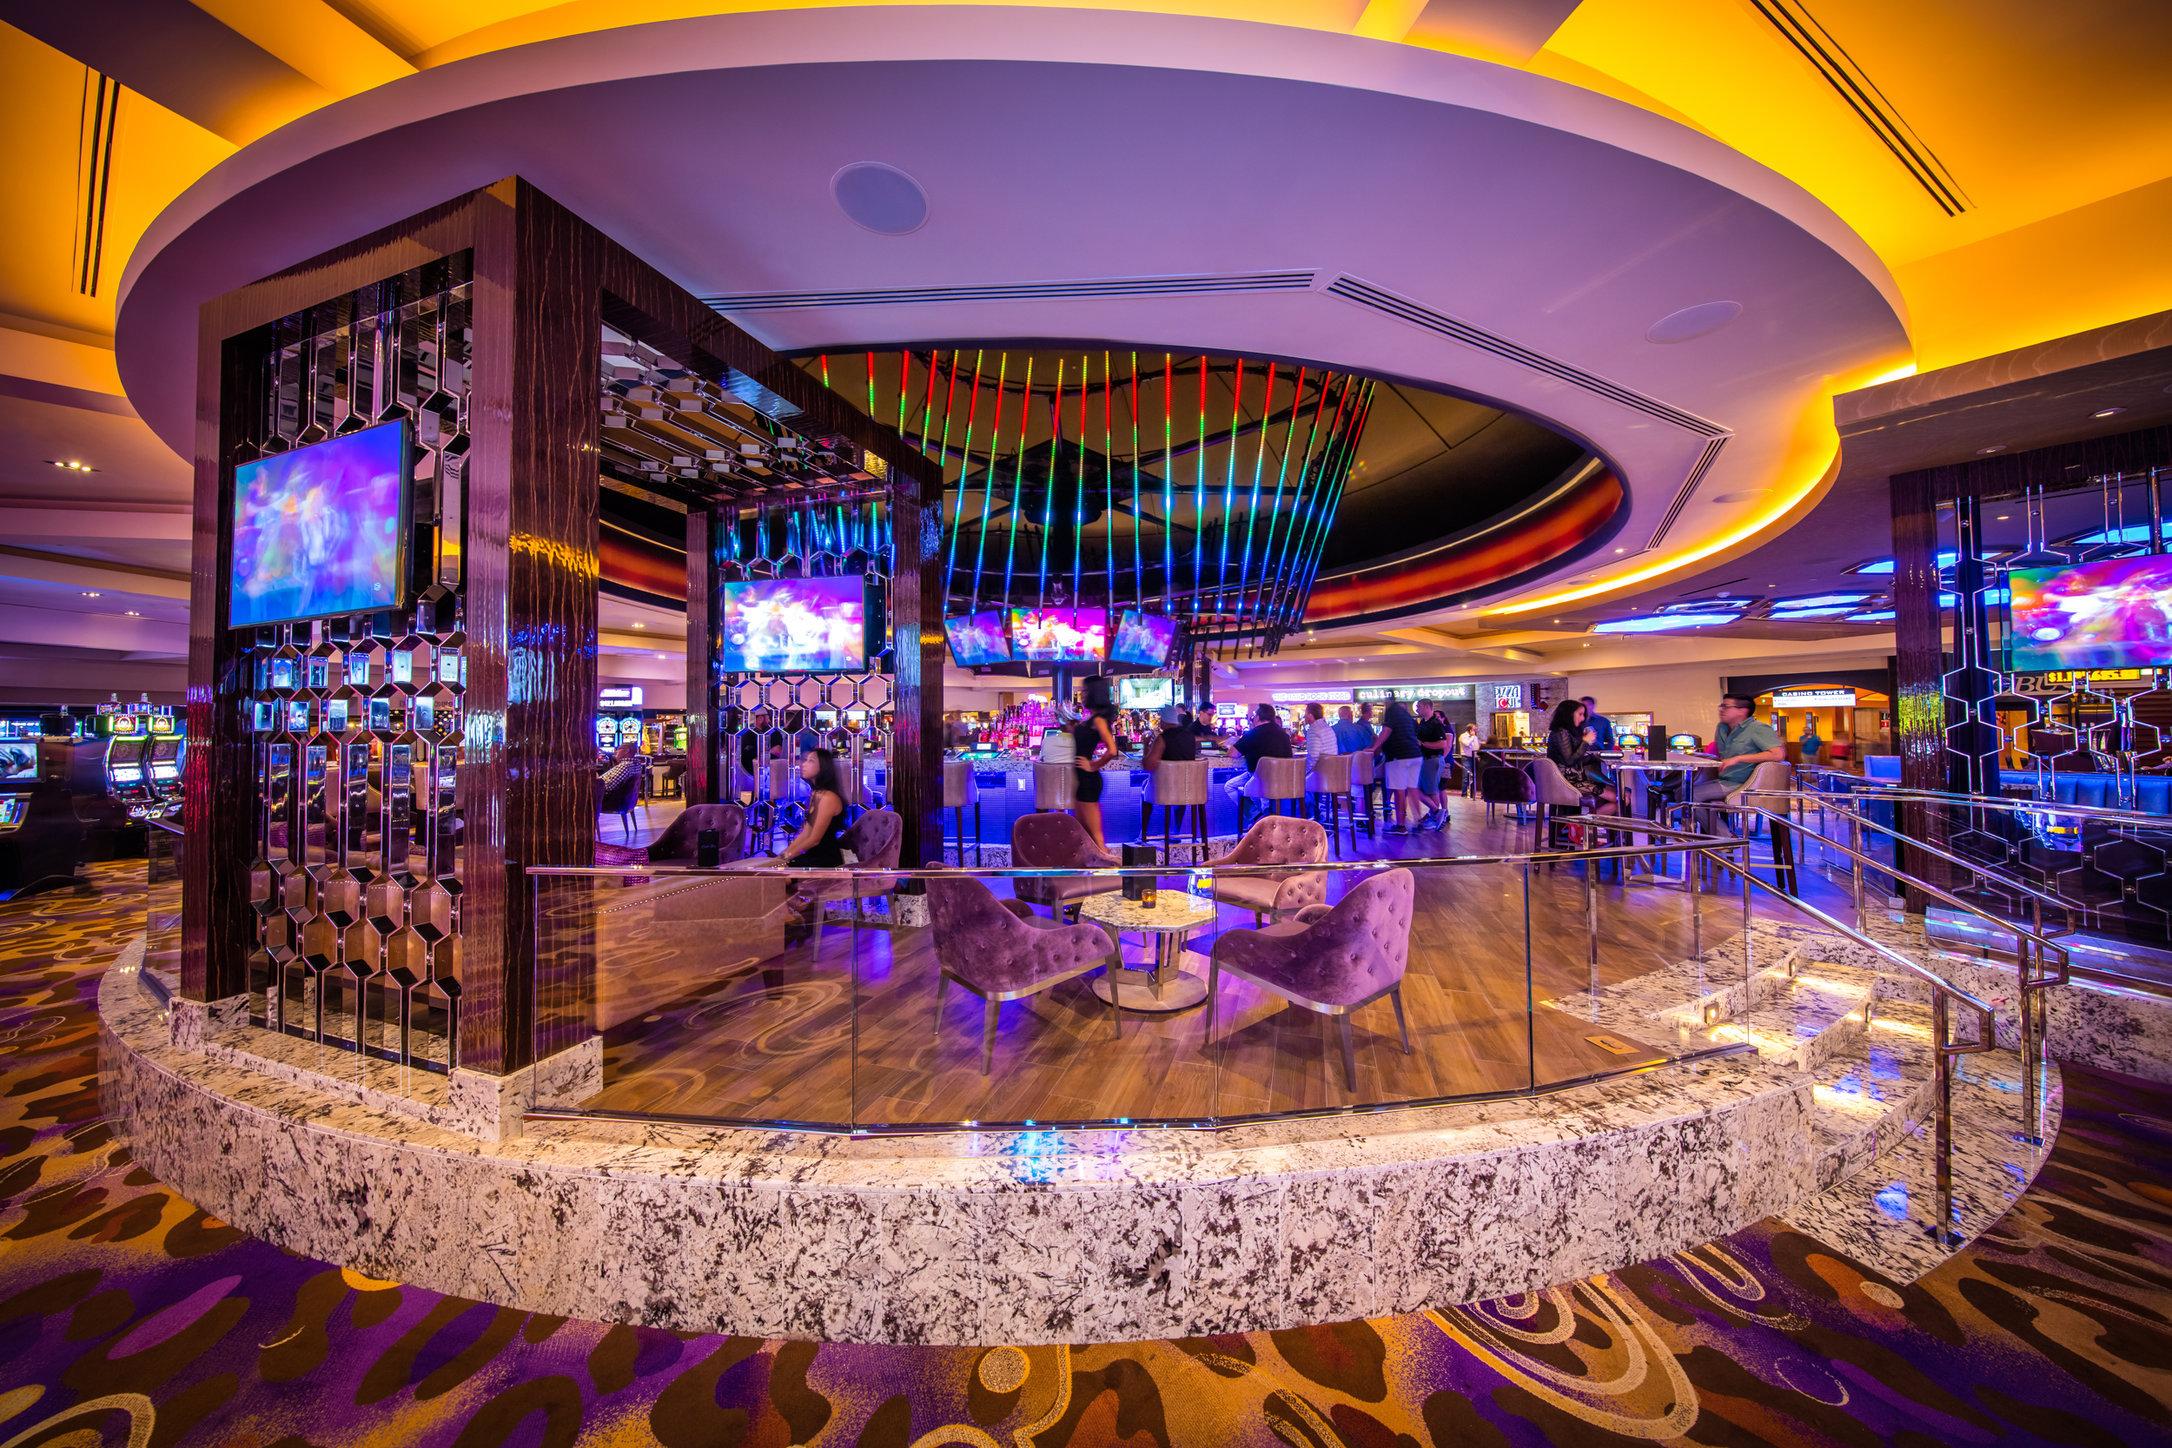 09_21_15_hrh_casino_cent_bar_editorial_kabik-279-LAYERS 2.jpg